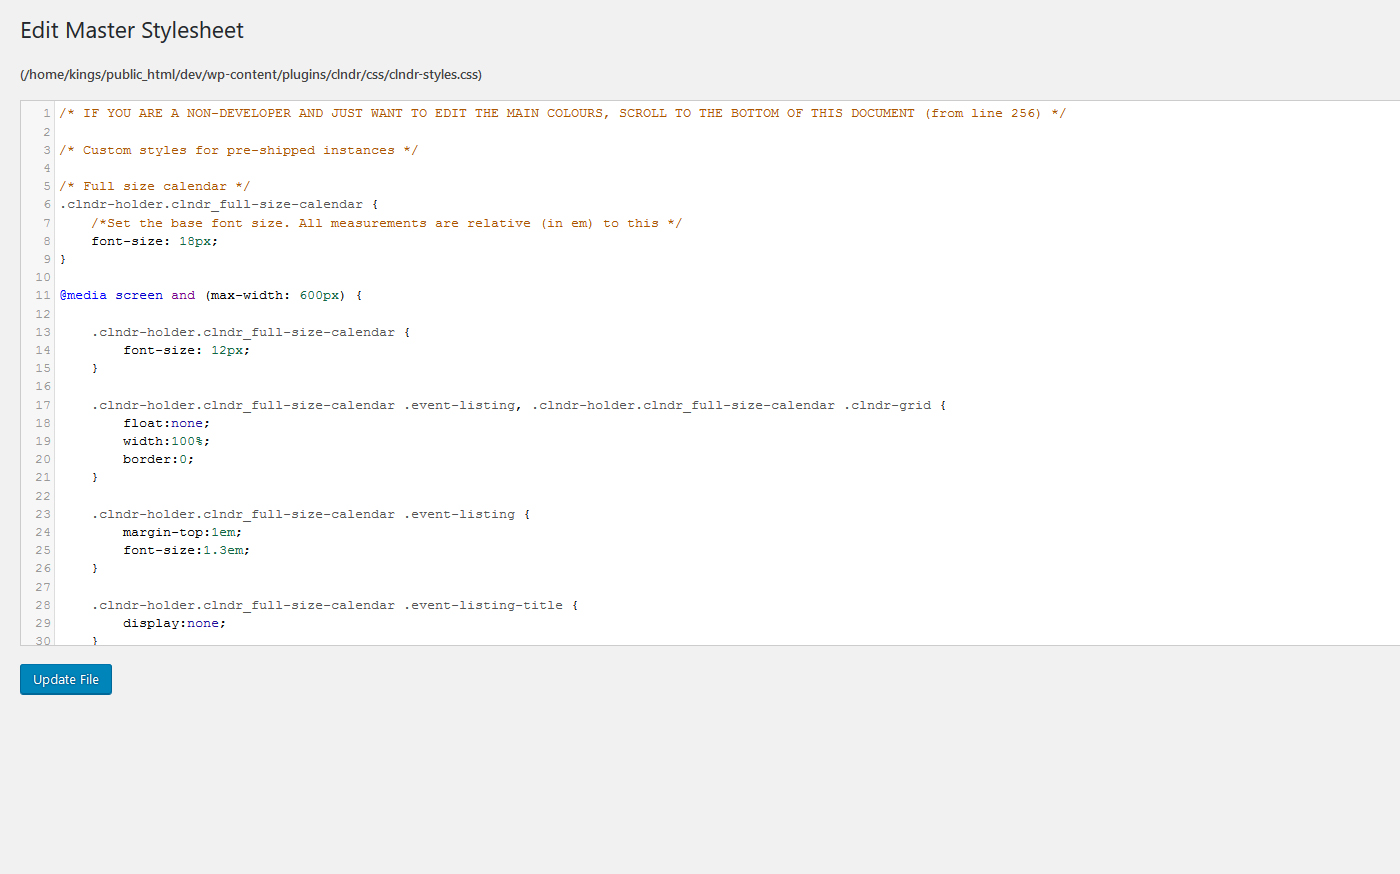 Stylesheet editor in admin view